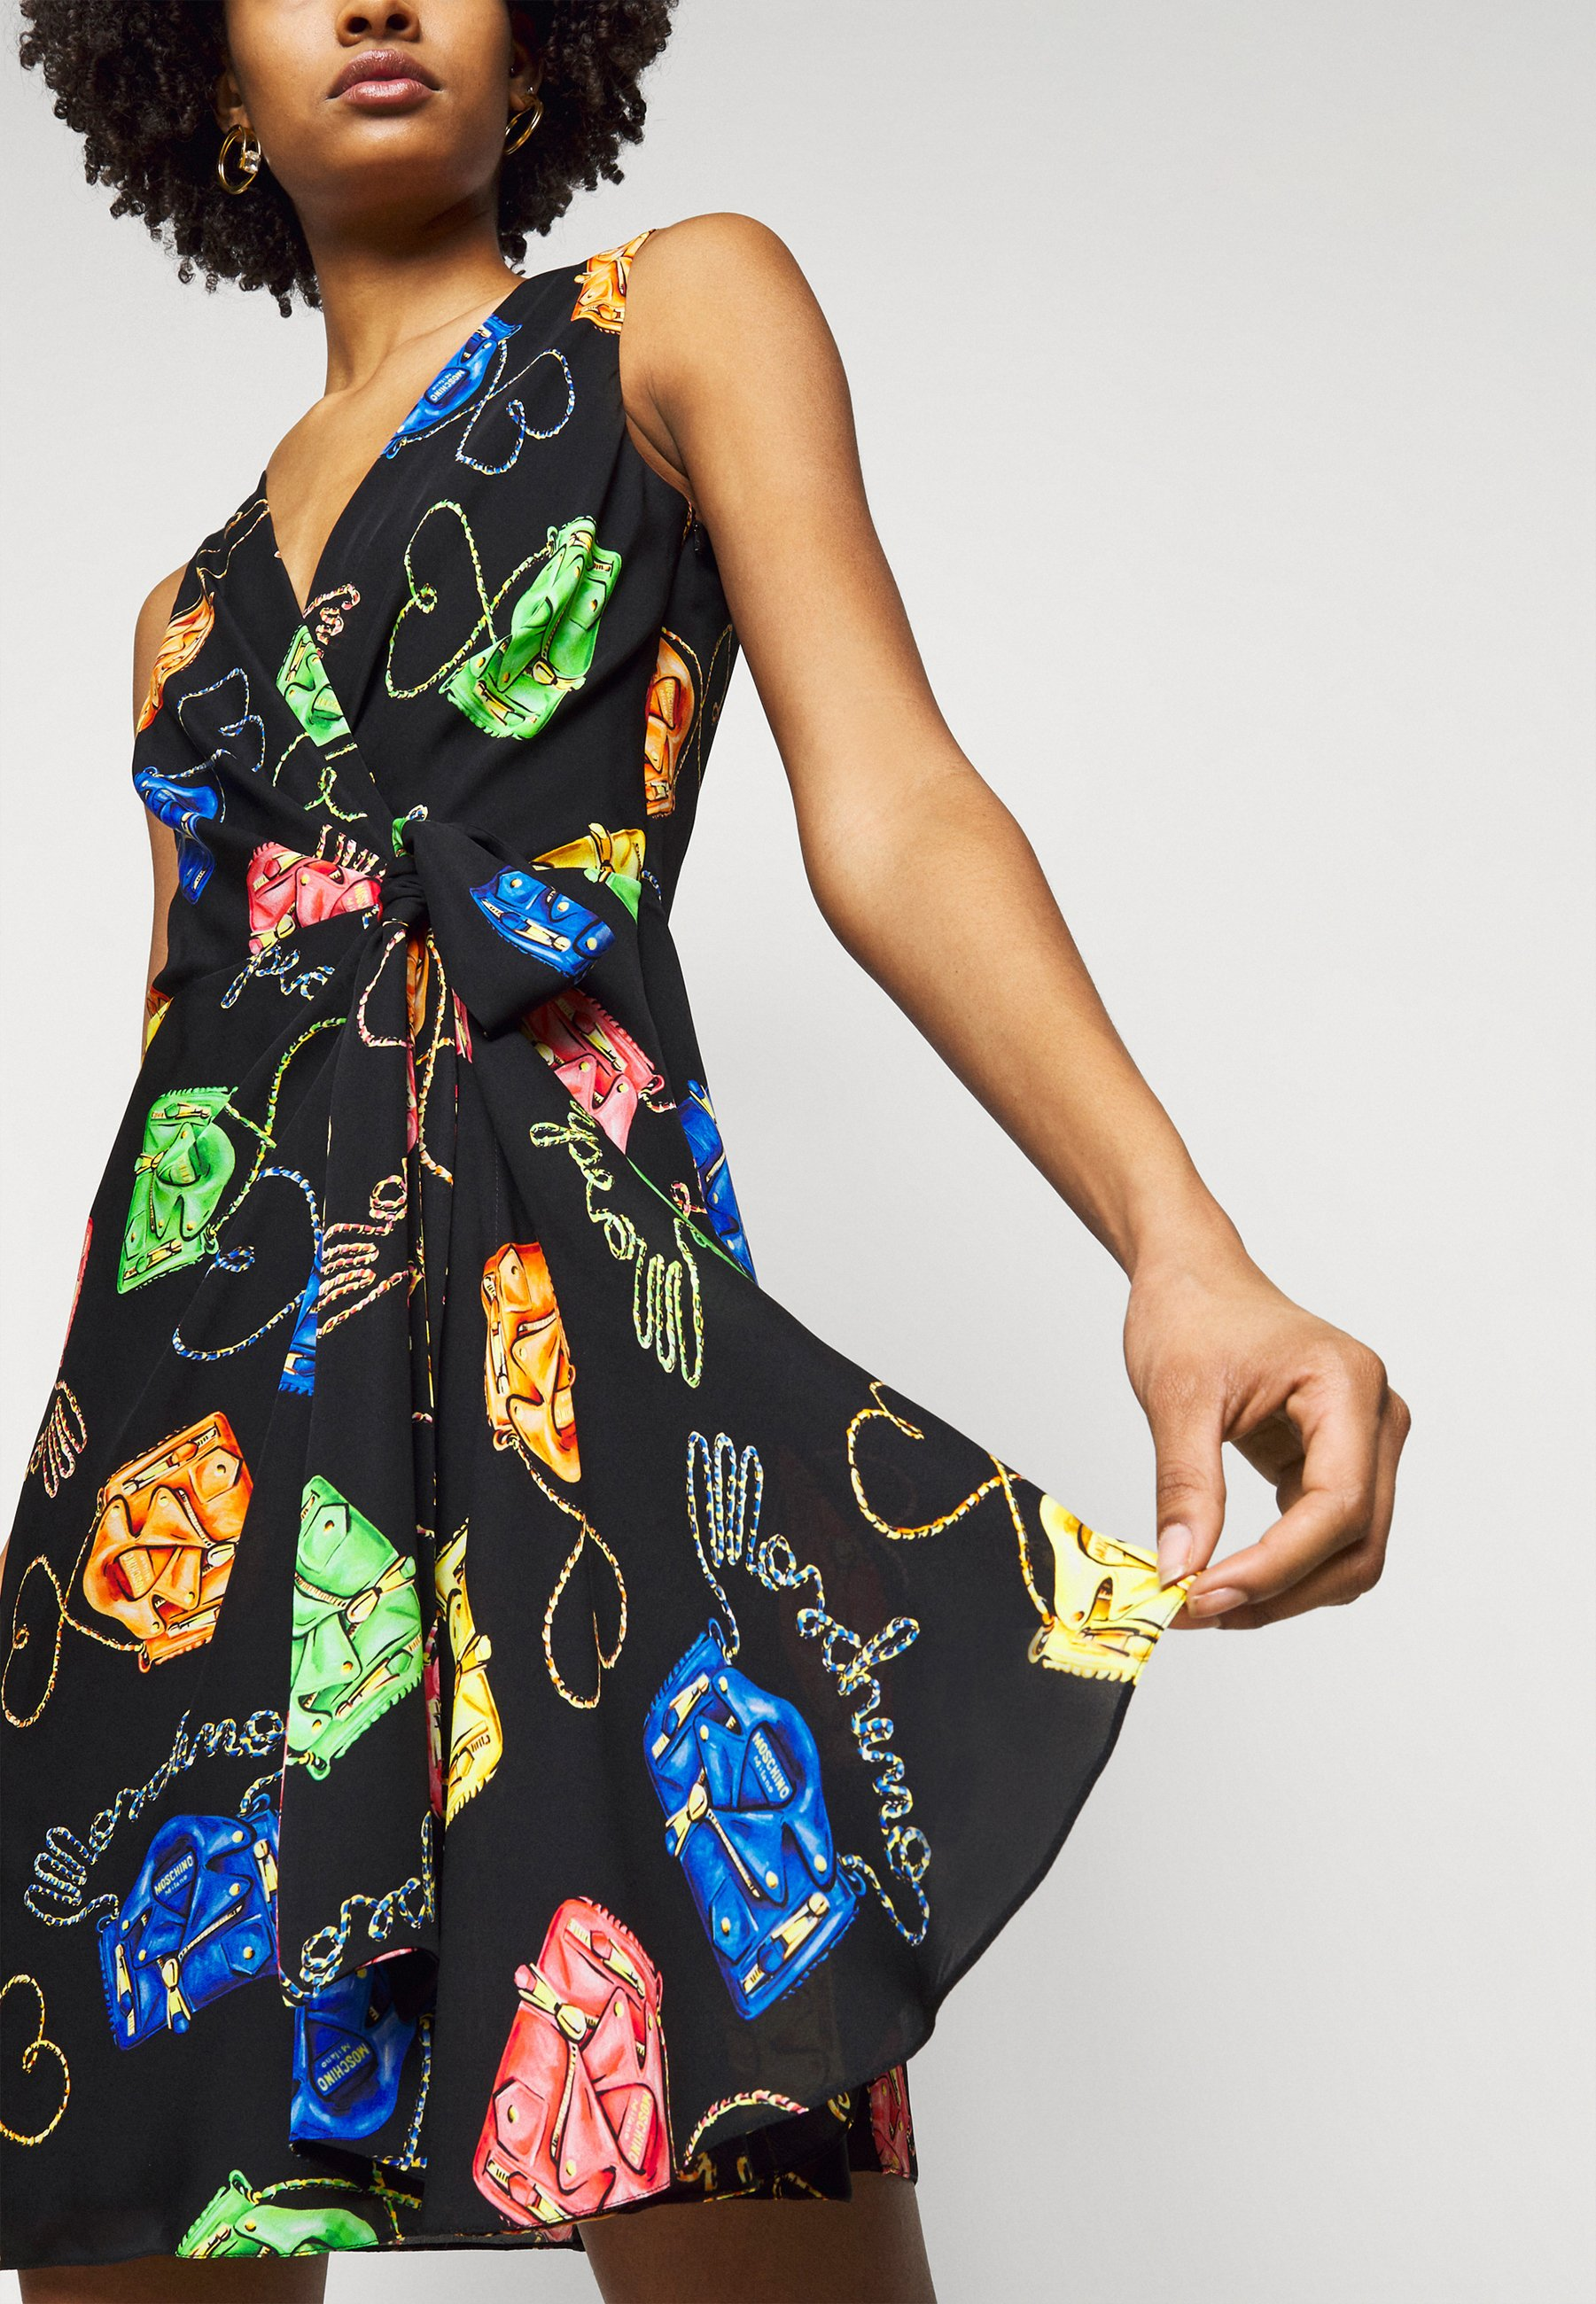 moschino dress,moschino dress,moschino dress,